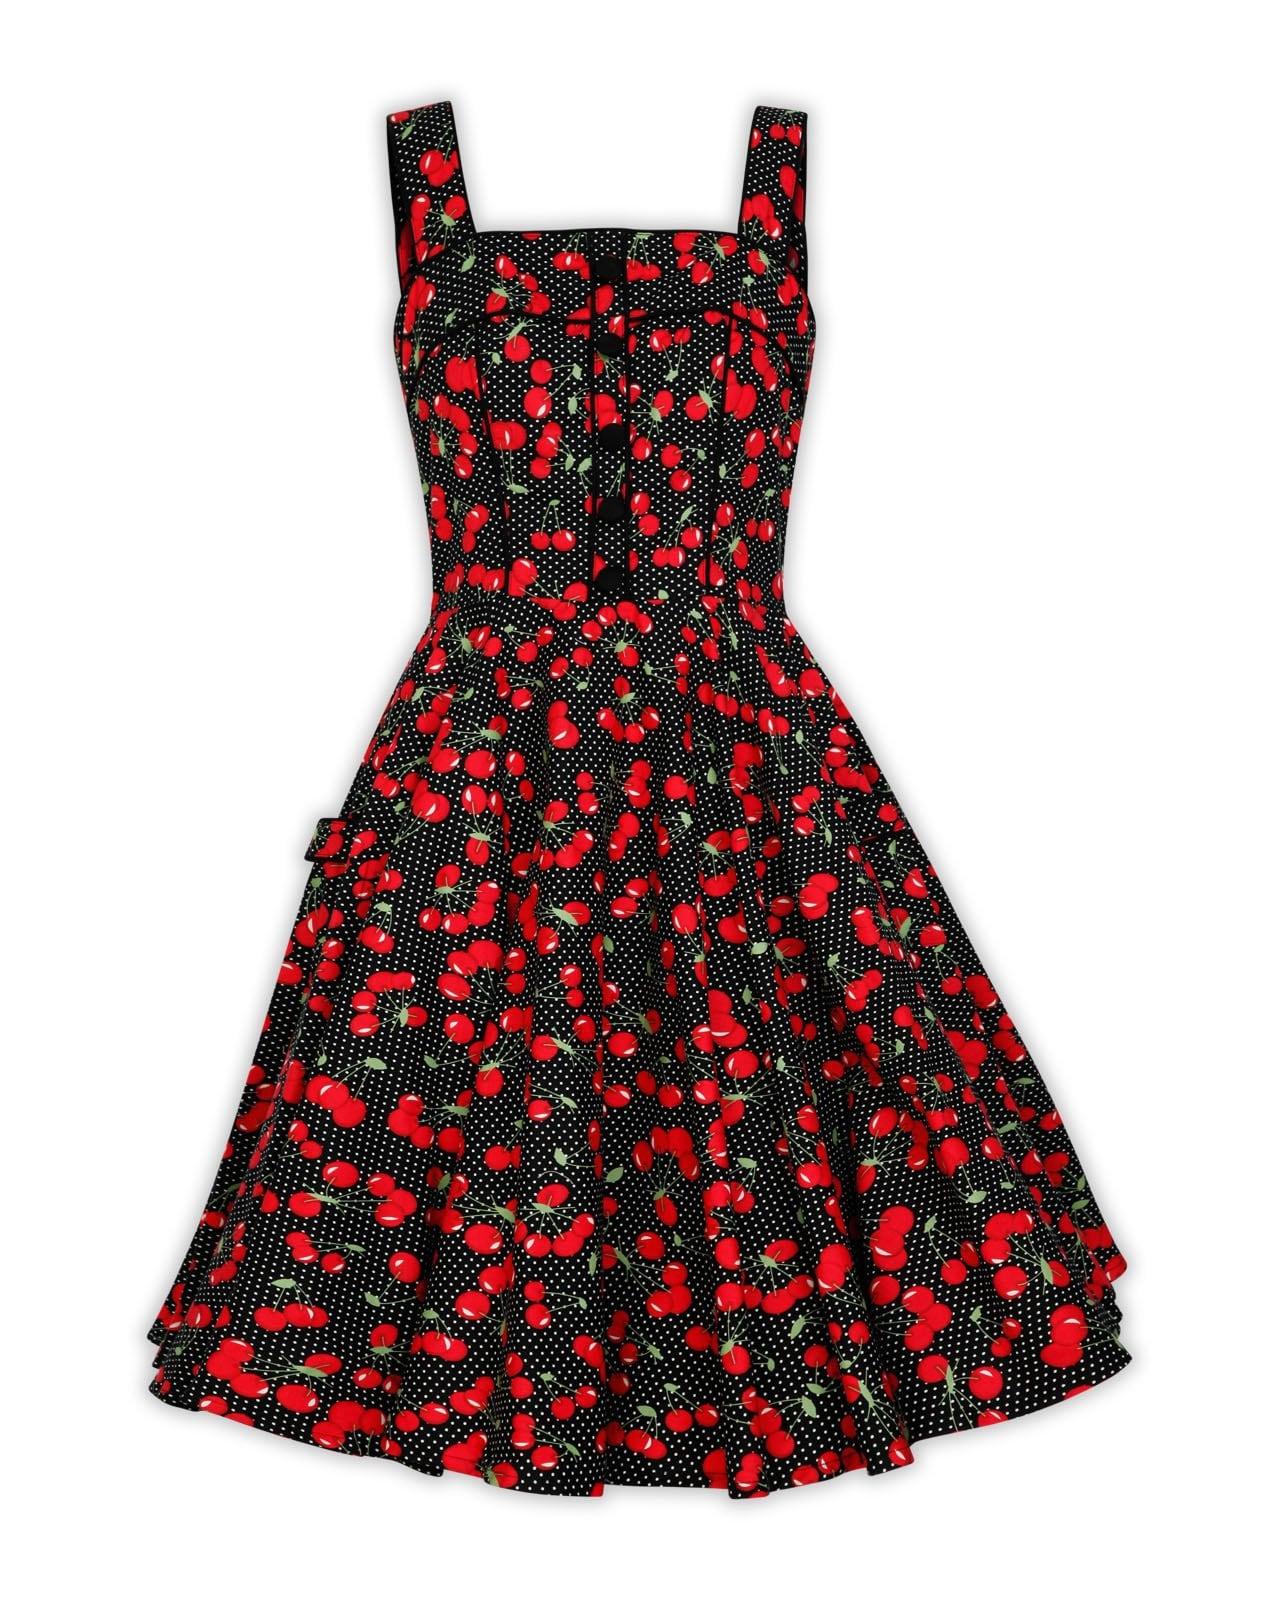 1453db6c1ab2 Plus Size Black Polka Dot Cherry Dress Red Cherry Dress Vintage Dress  Summer Dress Rockabilly Pinup Dress 50s Retro Party Dress Swing Dress